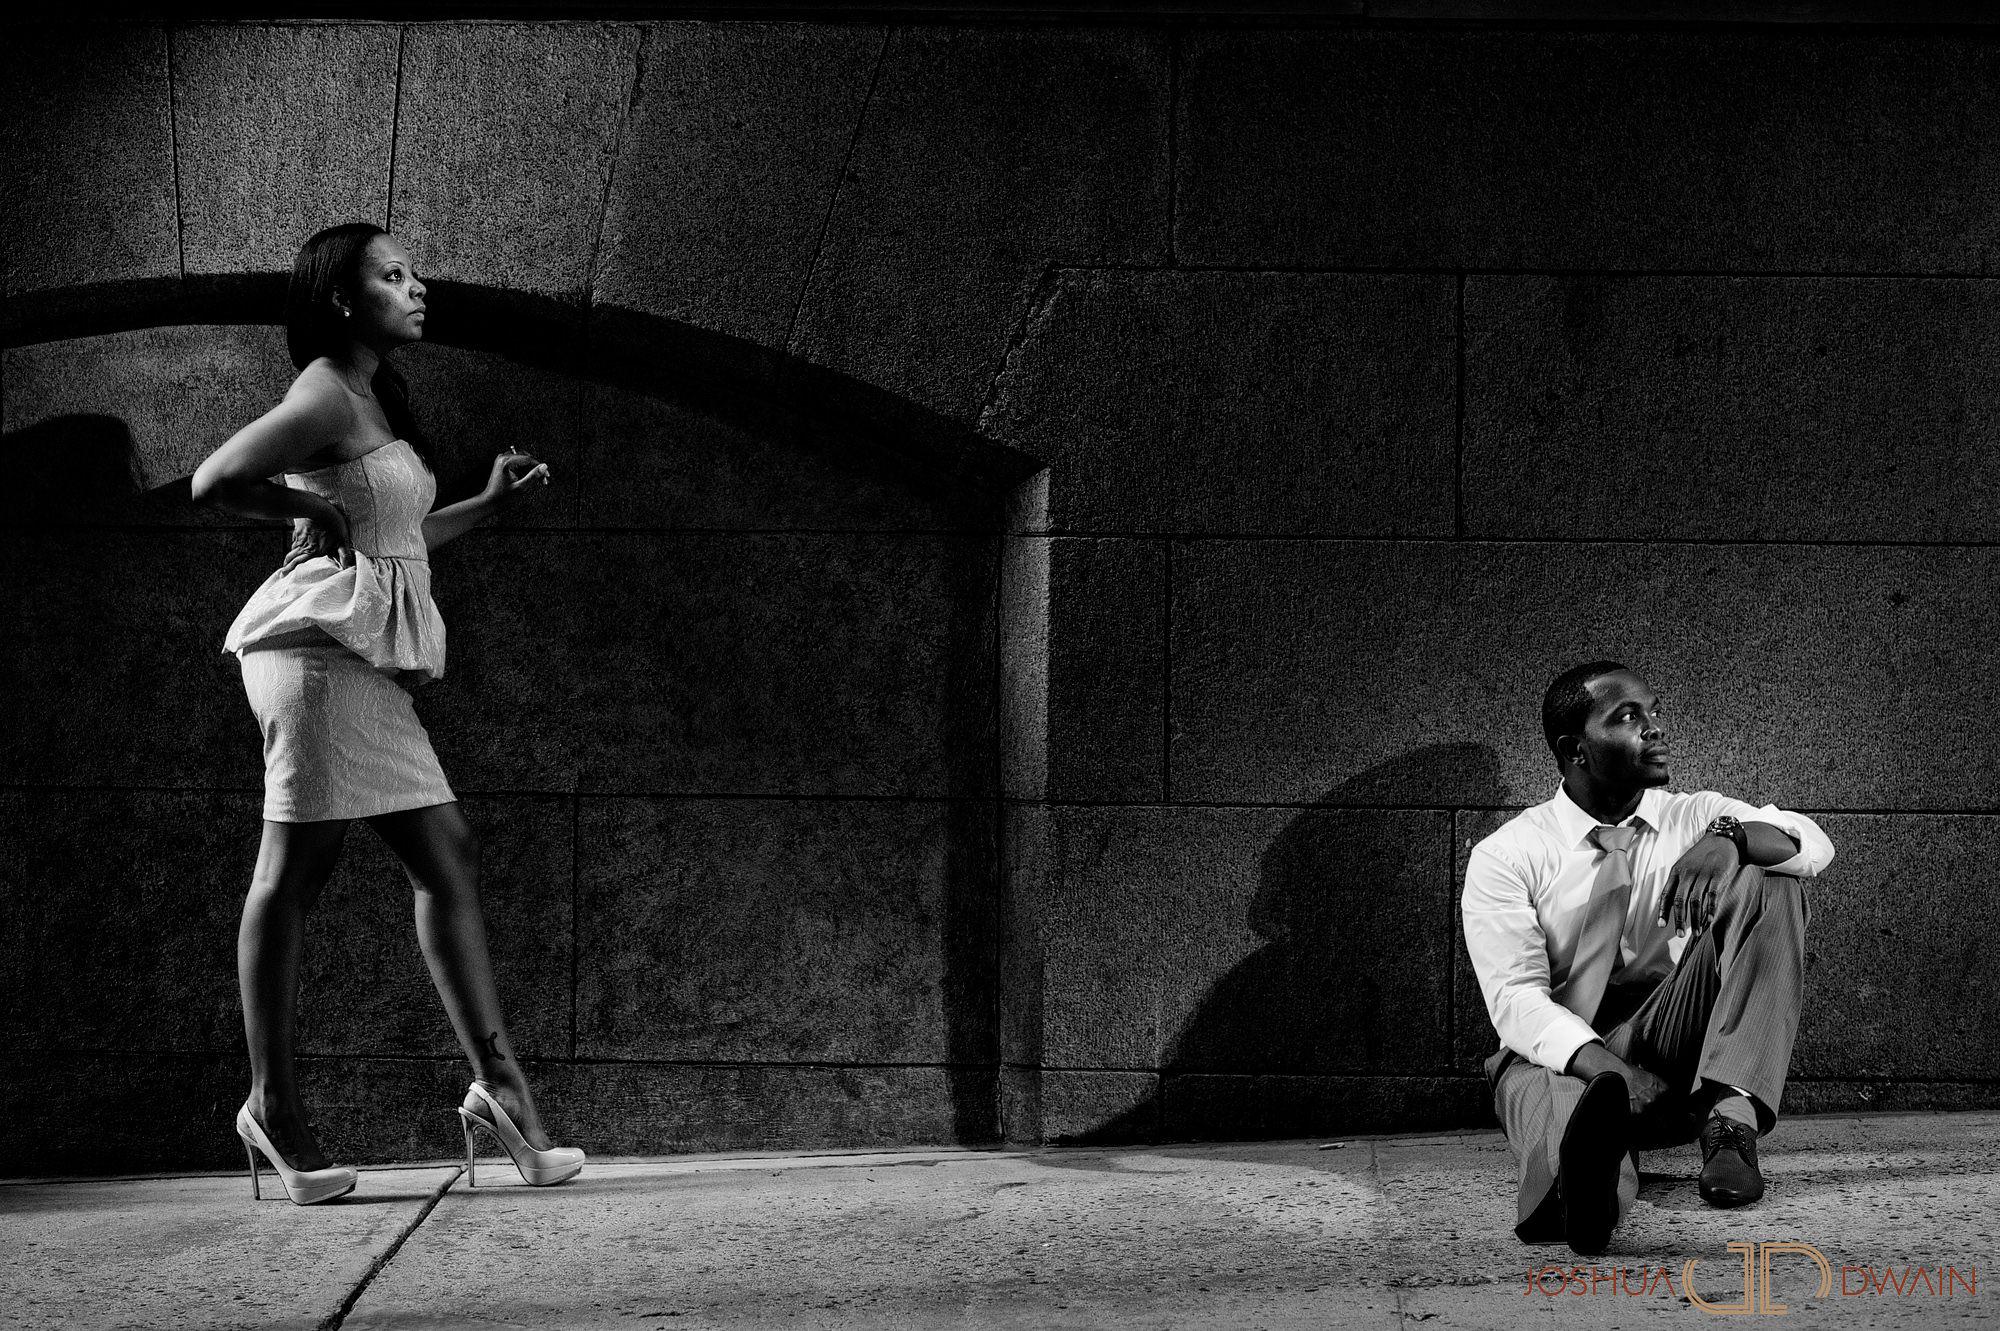 charisse-haynes-010-lower-manhattan-New-York-City-engagement-photographer-joshua-dwain